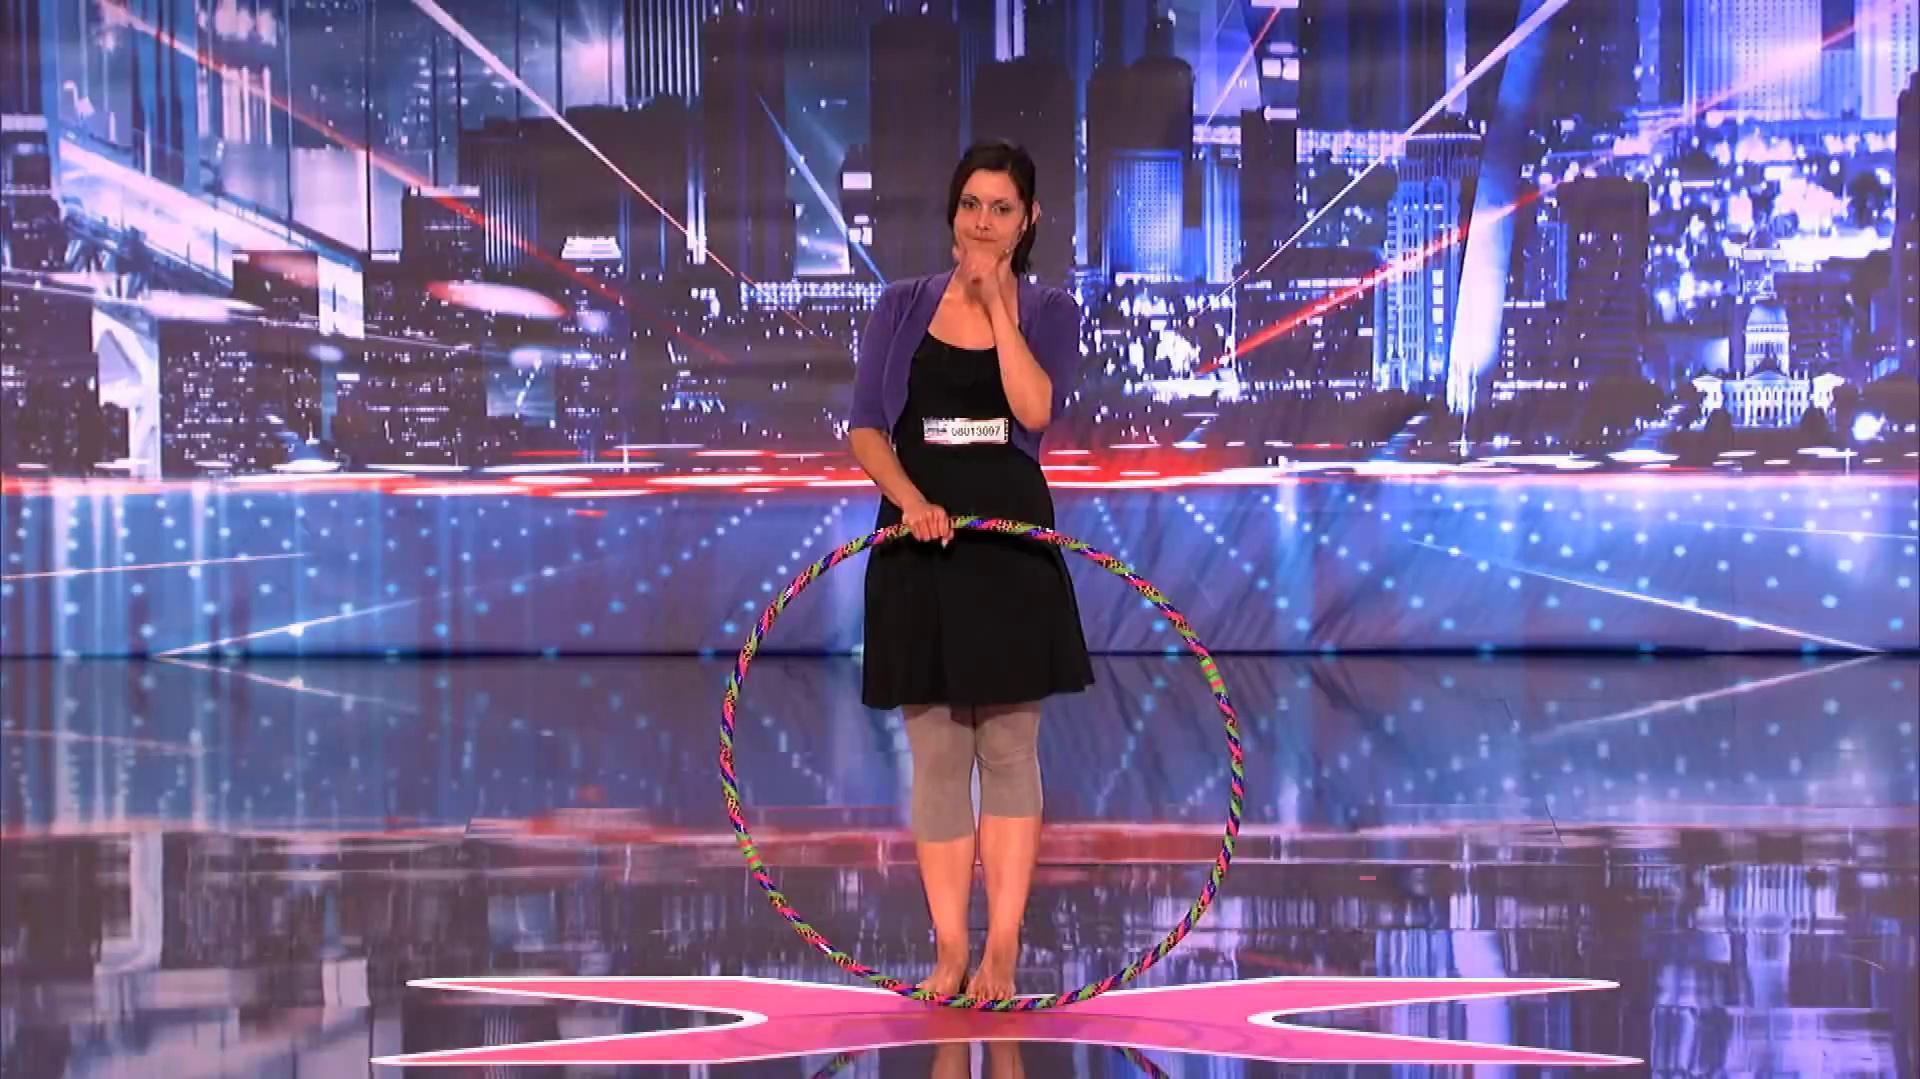 America's Got Talent 2013 - Season 8 - 089 - Lindsey the Hula Belching Girl Burps as She Hula Hoops